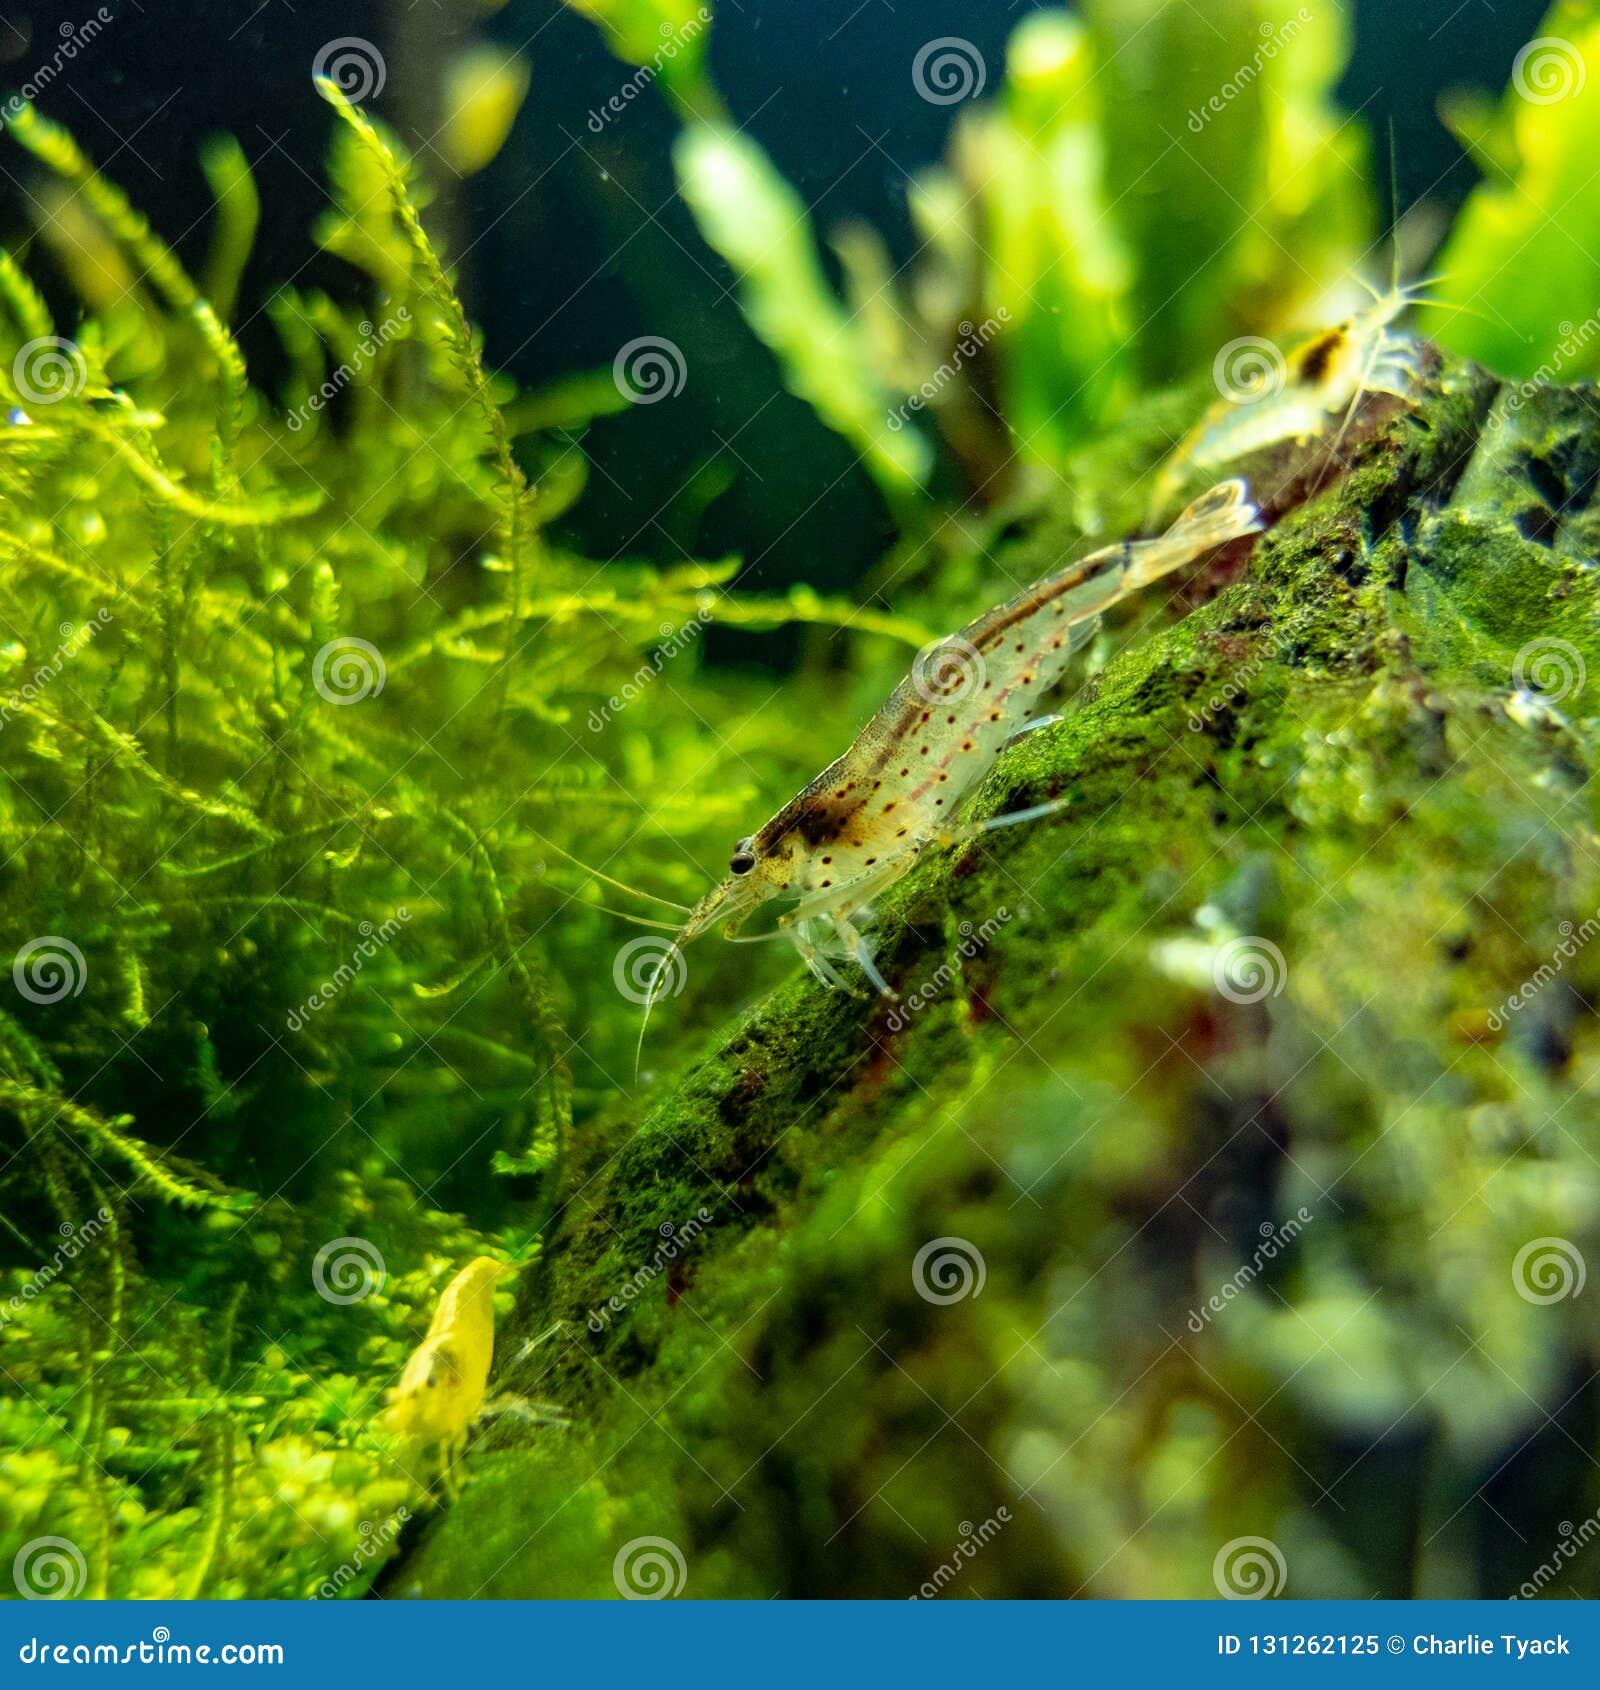 Amano and drawf yellow shrimps in nano freshwater tropical tank